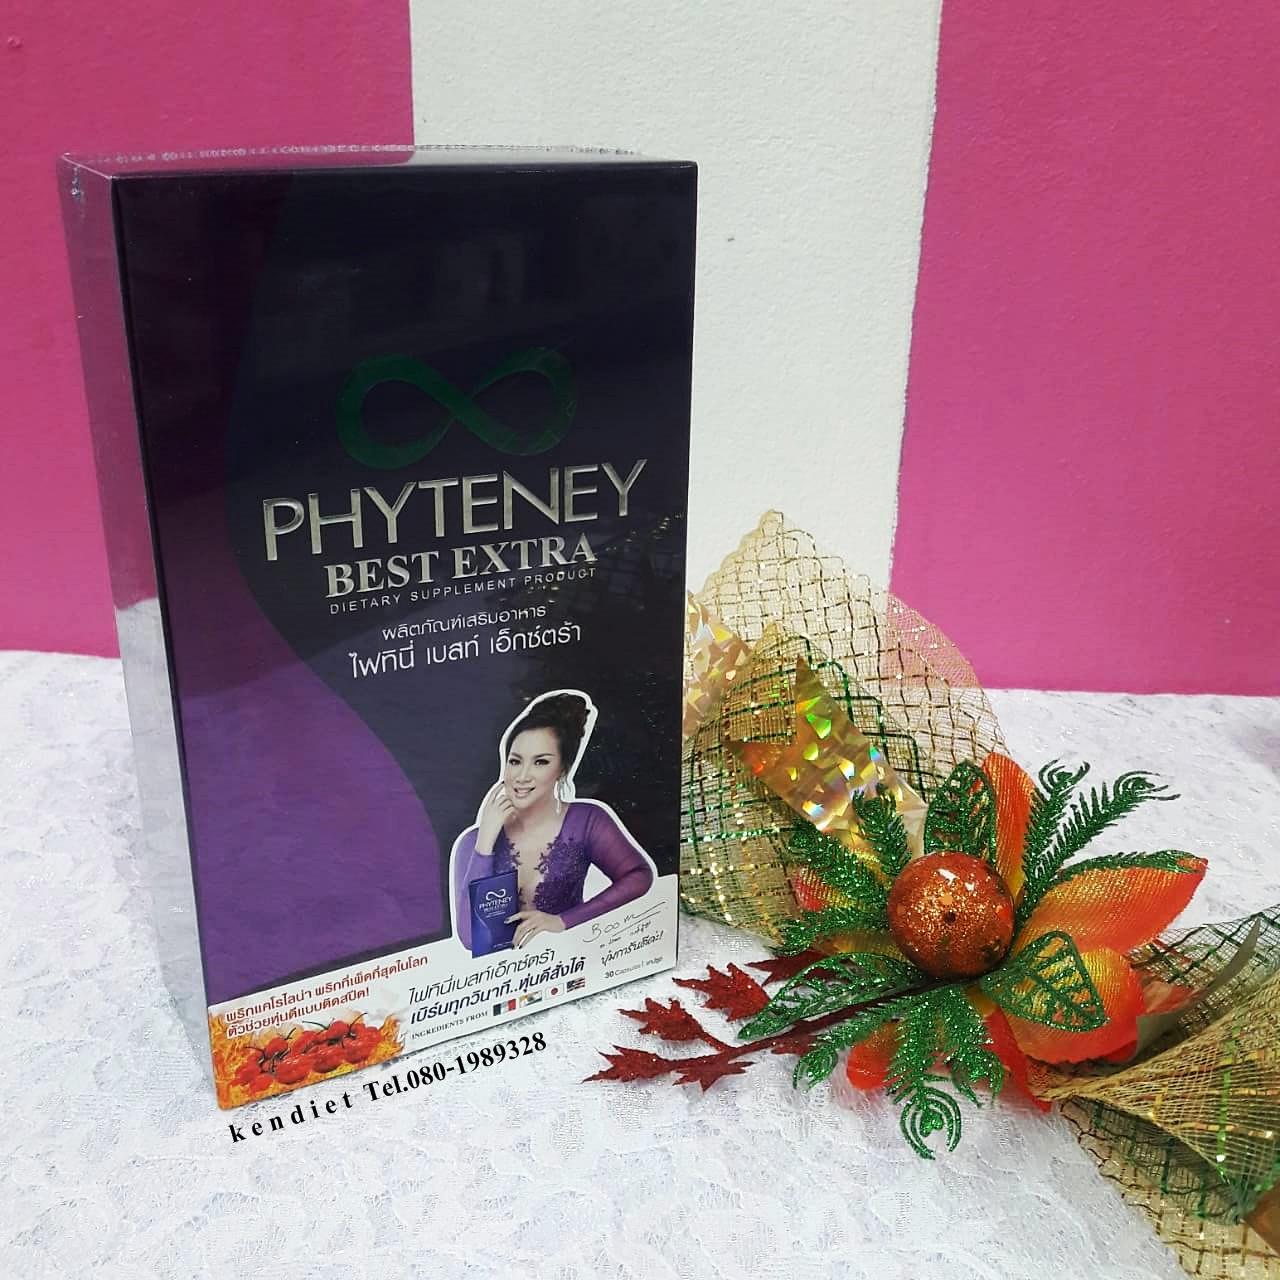 Phyteney Best Extra ไฟทินี่ เบสท์ เอ็กซ์ตร้า เบิร์นทุกนาที หุ่นดีสั่งได้ คุณบุ๋ม การันตีค่ะ